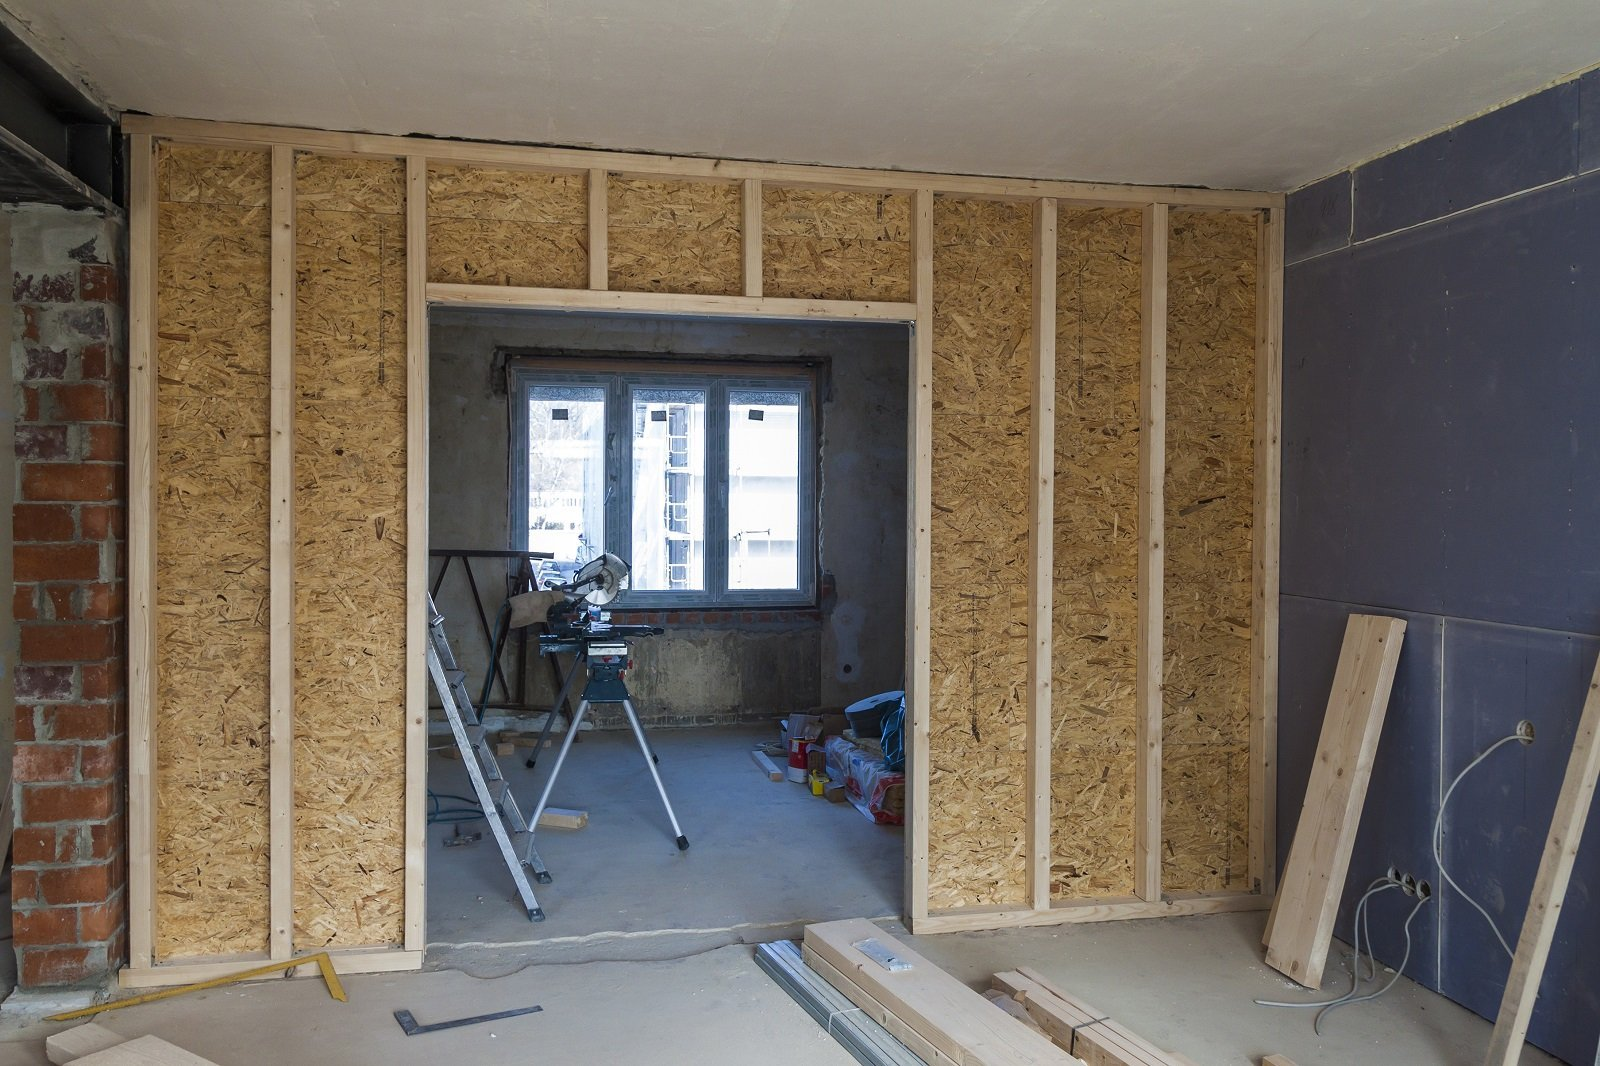 Interno di una casa in costruzione